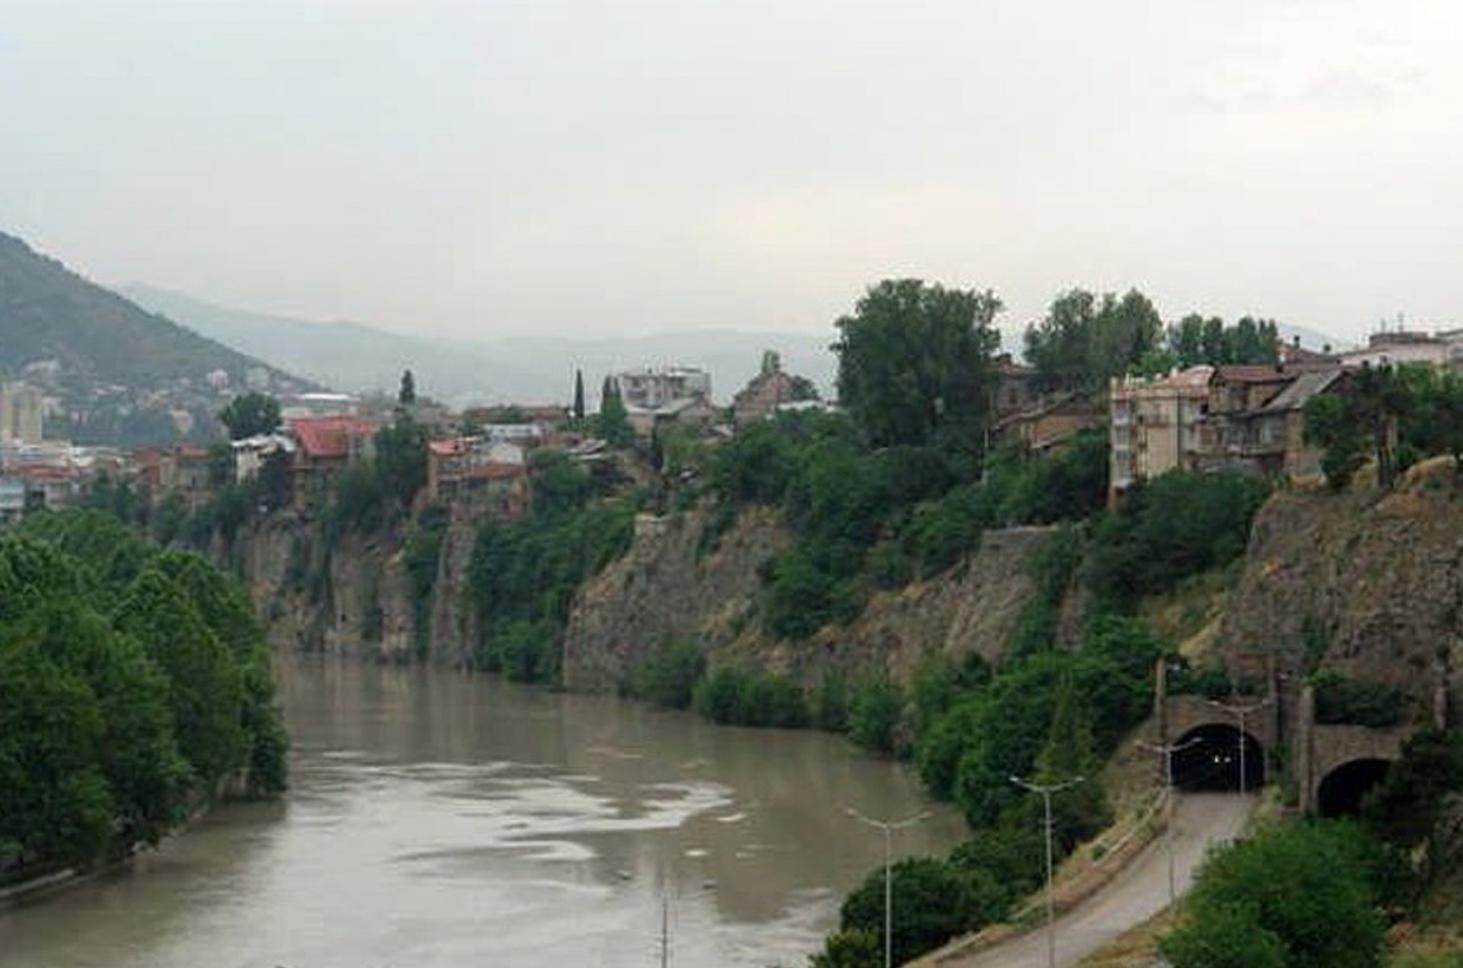 Tibilisi_site photo_river